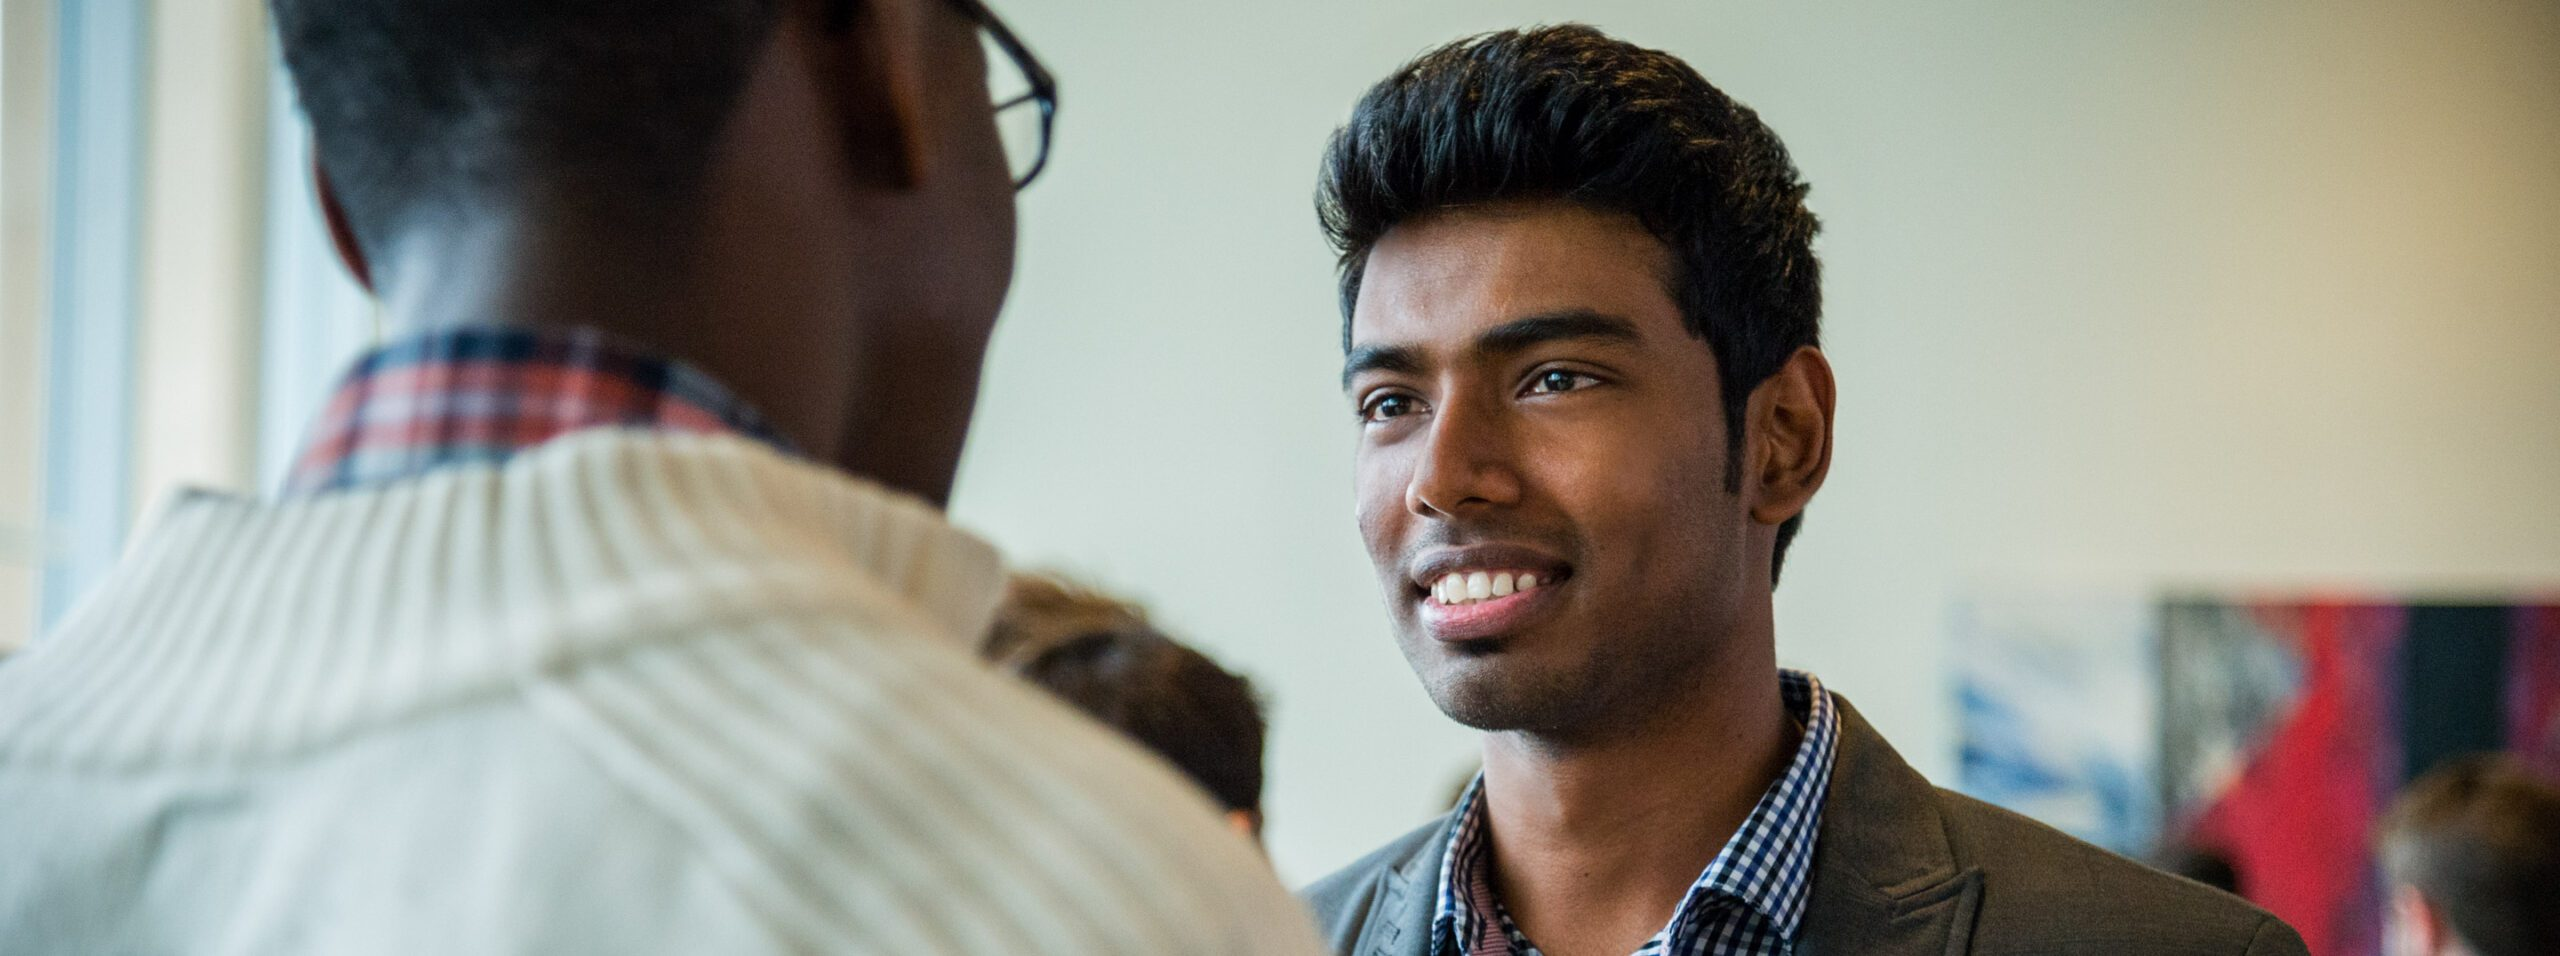 Students talk at a campus event